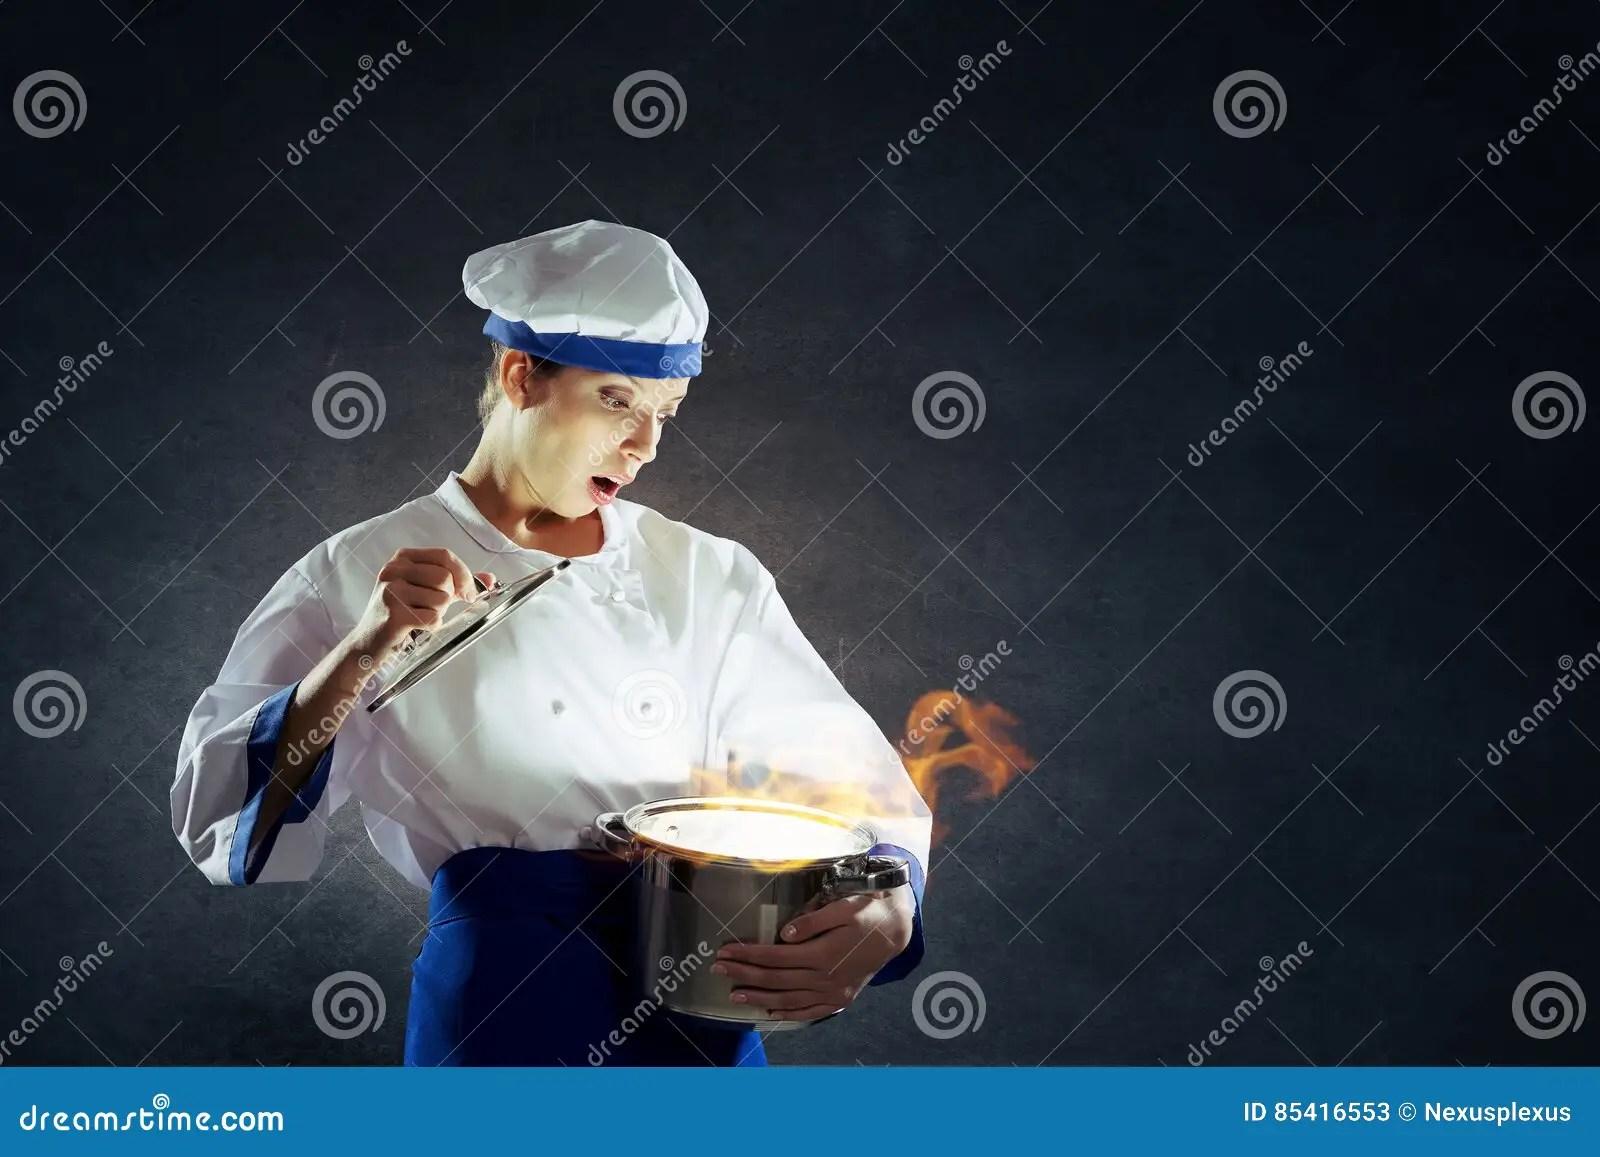 kitchen magician grohe faucet cartridge replacement 她是魔术师作为厨师混合画法库存图片 图片包括有逗人喜爱 正餐 厨房 做在平底锅上的年轻可爱的厨师妇女魔术